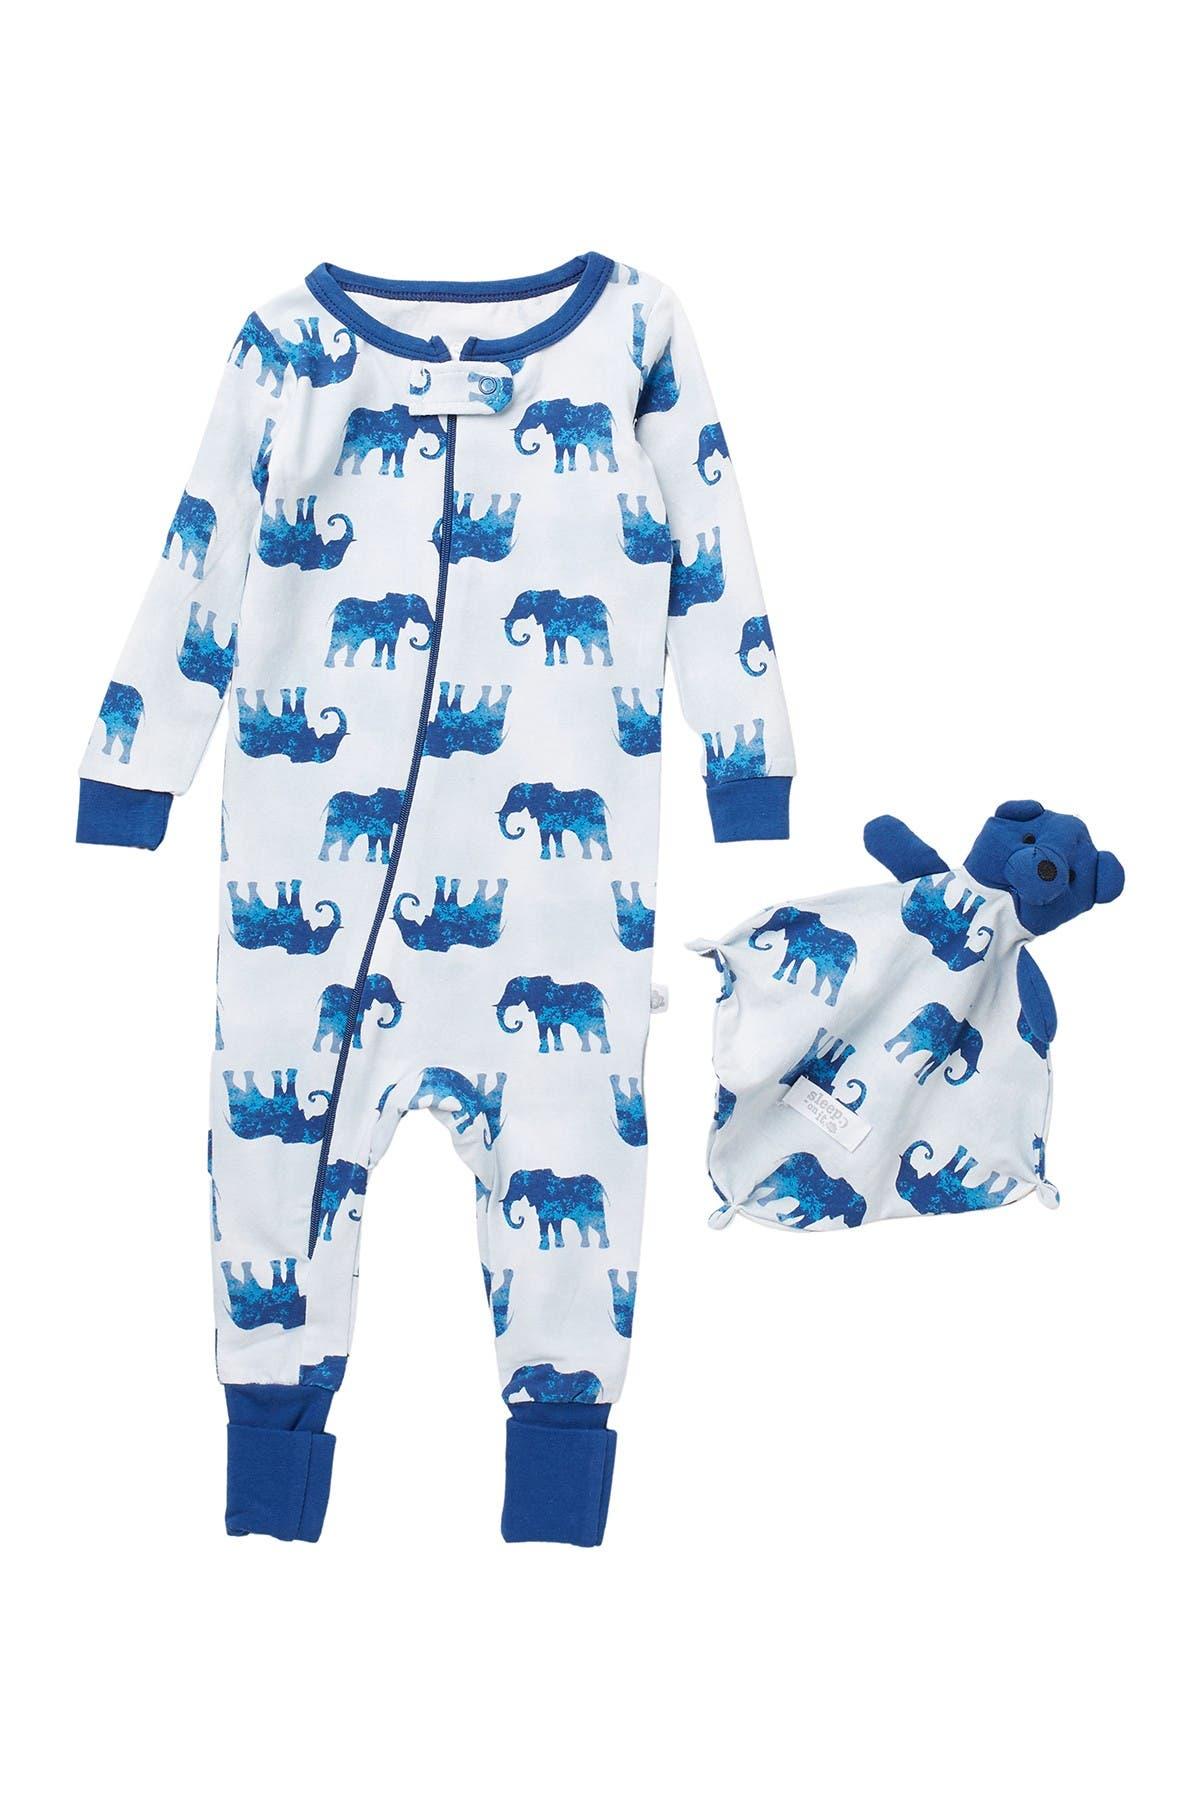 Image of CLOUD NINE Coverall Pajamas with Blankey